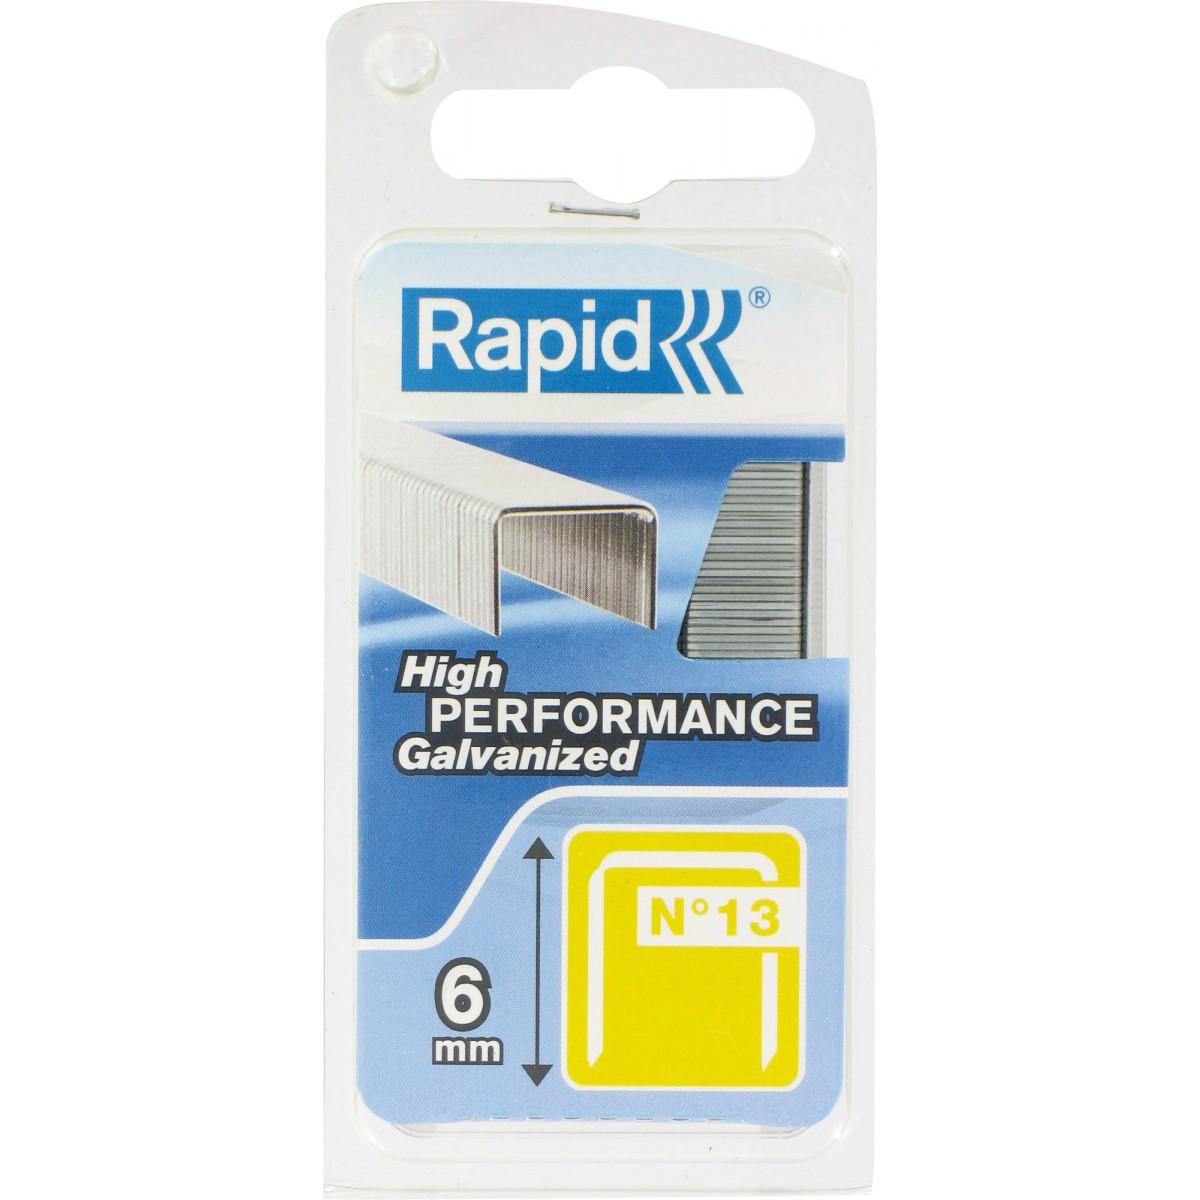 Agrafe n°13 Rapid Agraf - Hauteur 6 mm - 1600 agrafes